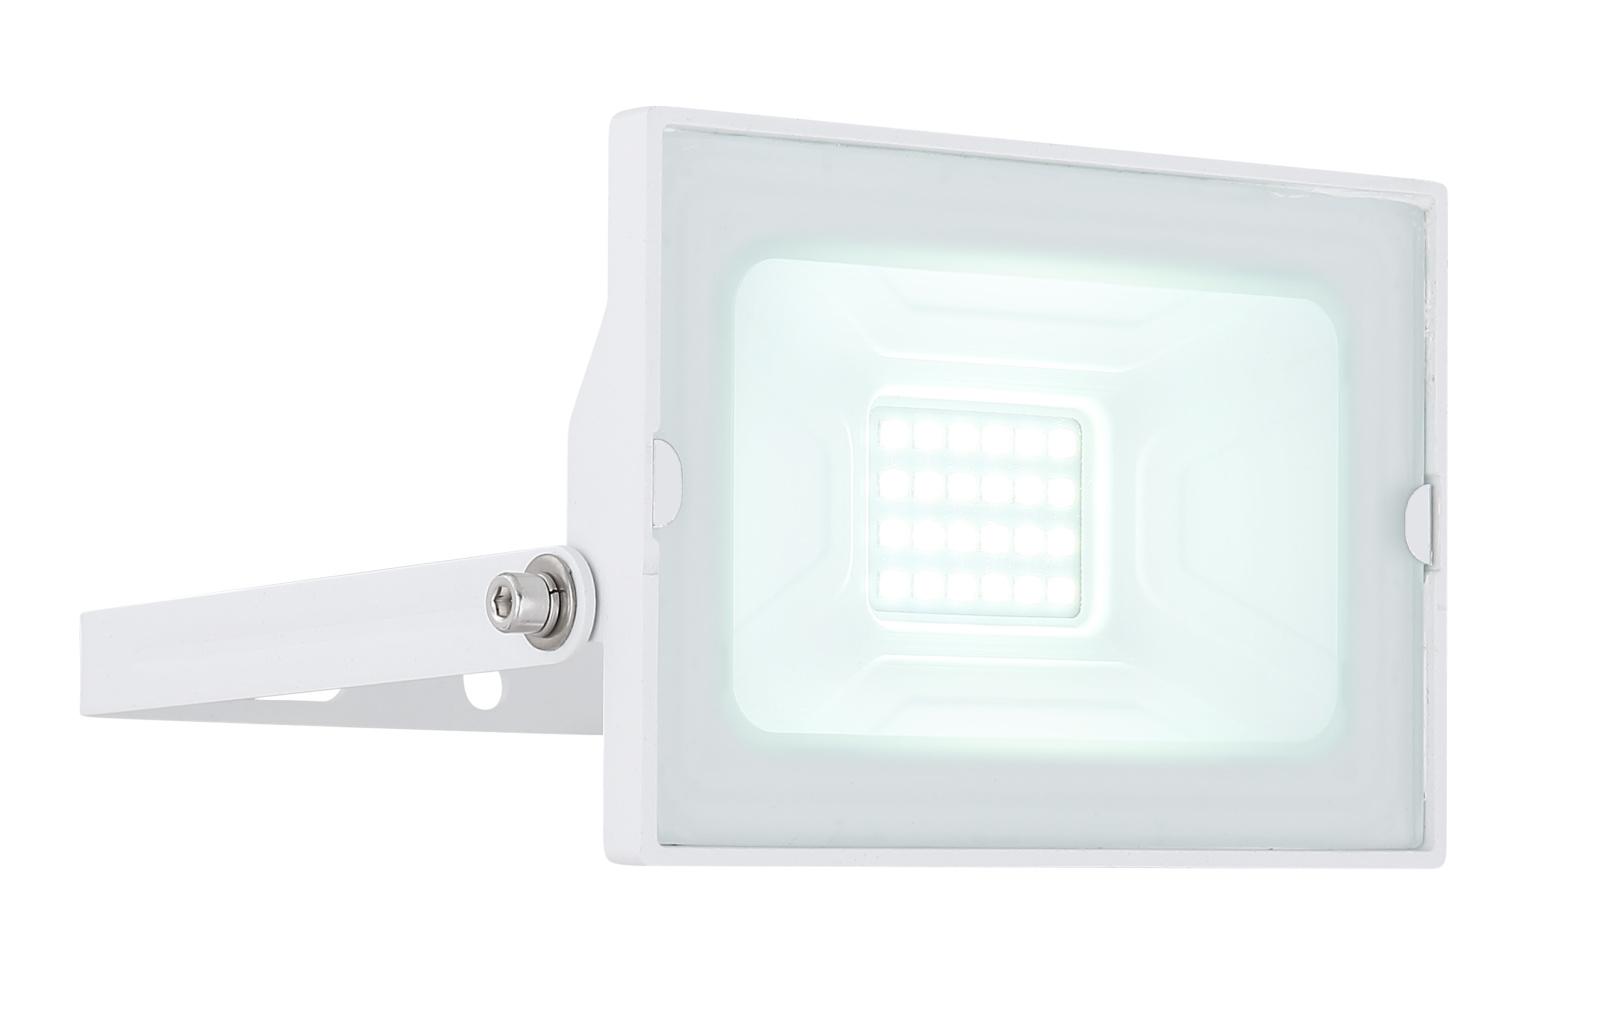 Kültéri reflektor fekete alumínium, üveg búrával.  IP65 inkl. 1xLED 20W 230V, 1500lm, 6000K